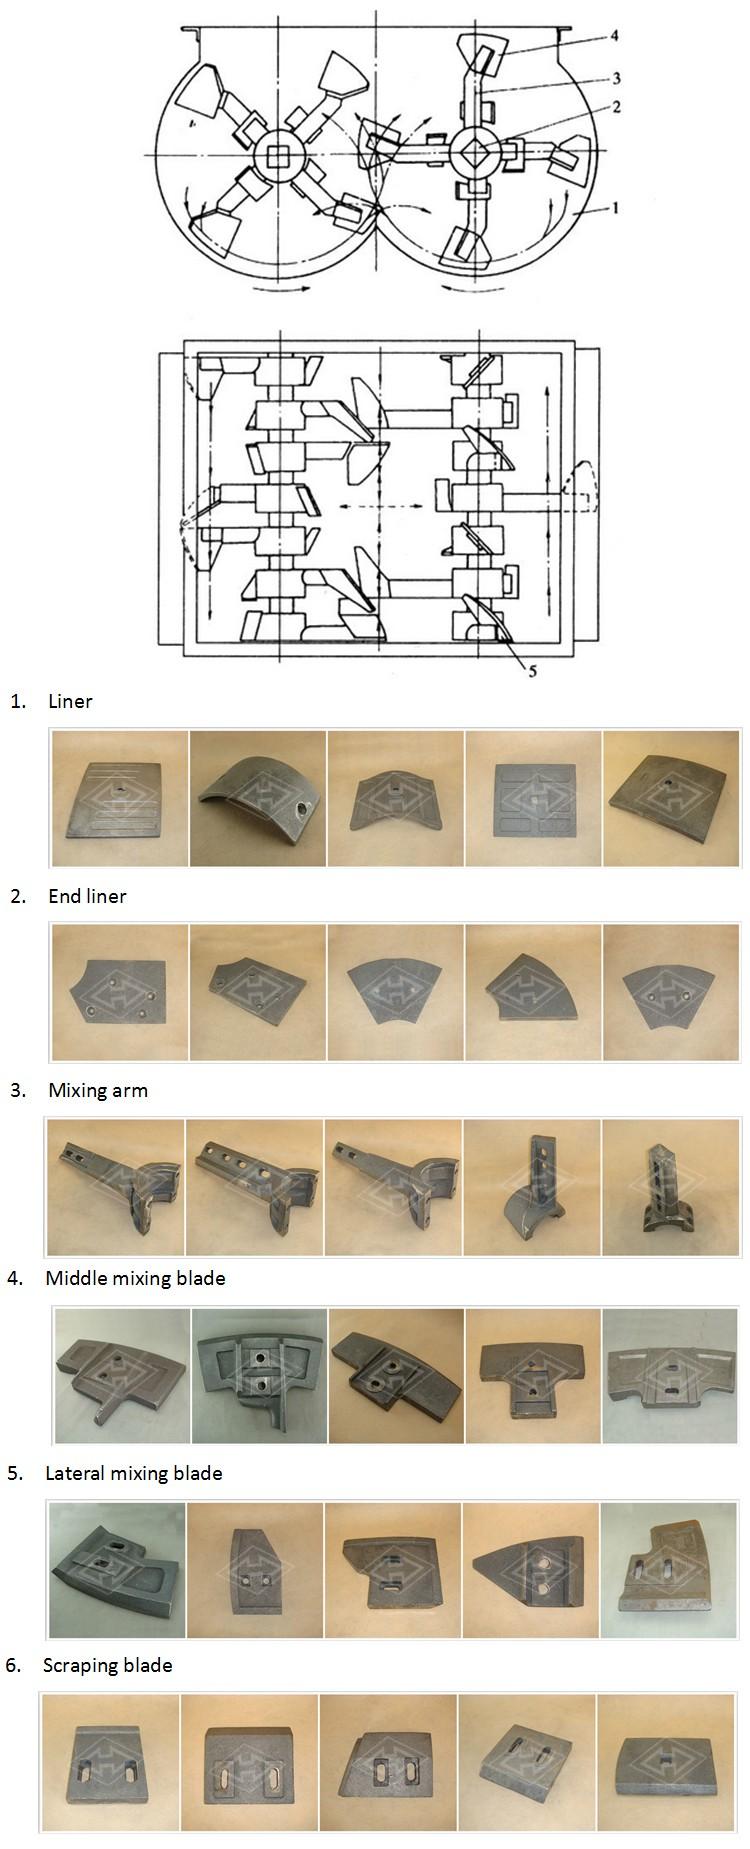 Concrete Mixer Mixing Arm Id 9990968 Buy China Concrete